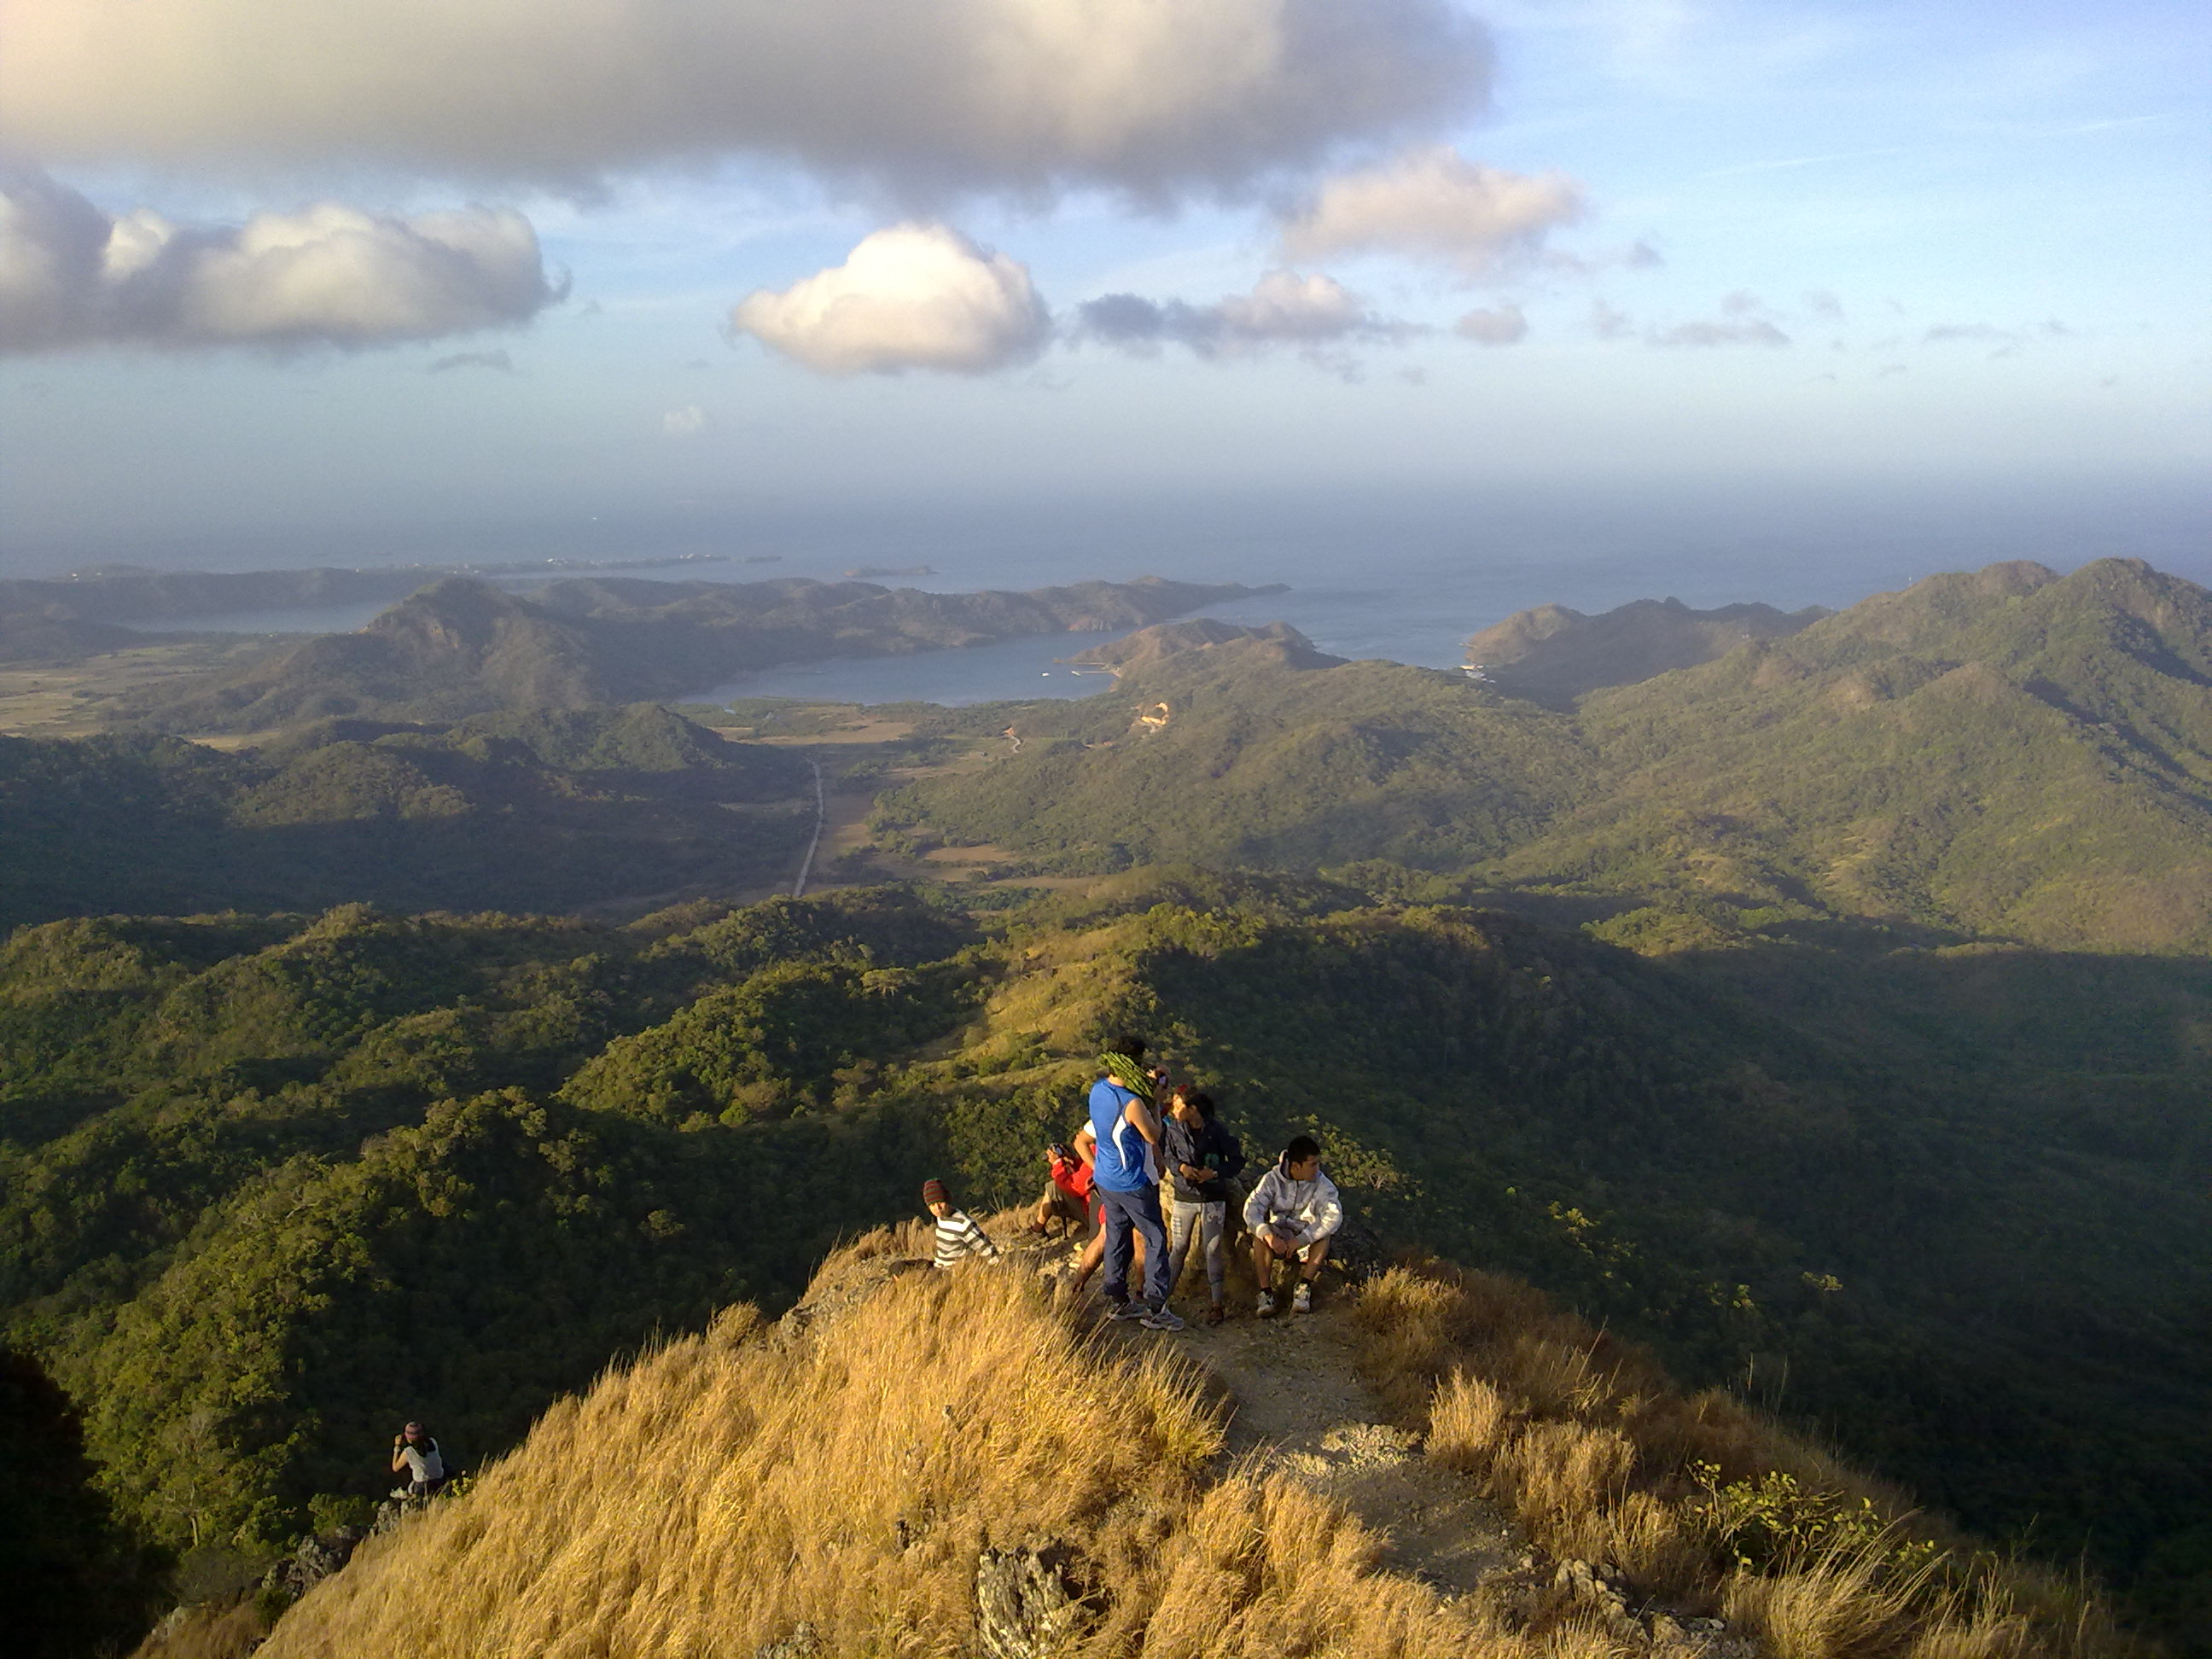 Pico de Loro Summit